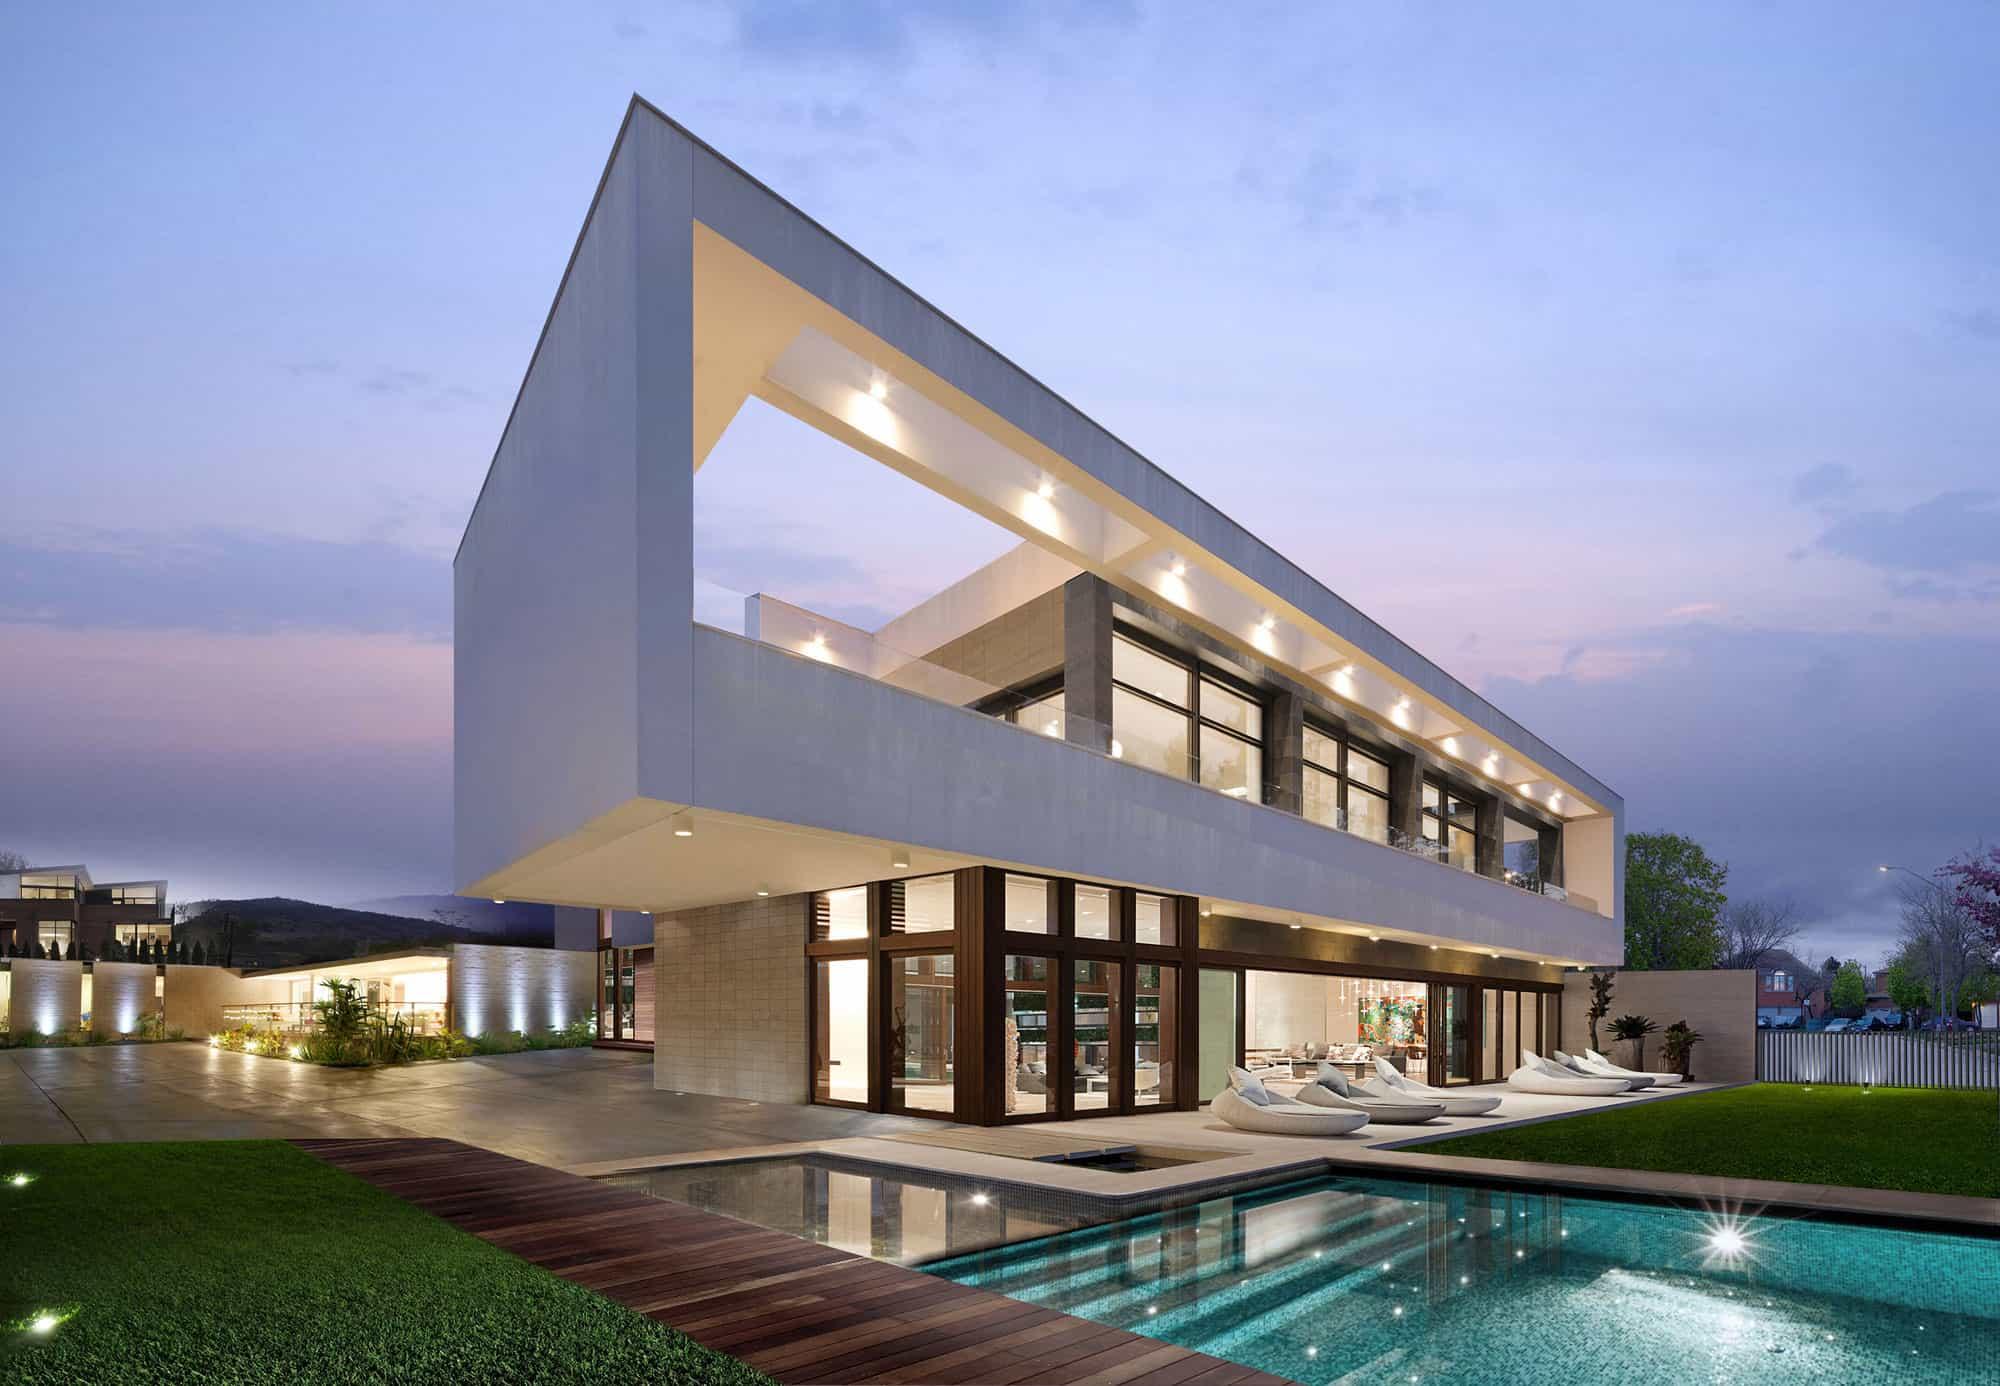 Wolf Architects Design a Contemporary Villa in Los Angeles, California